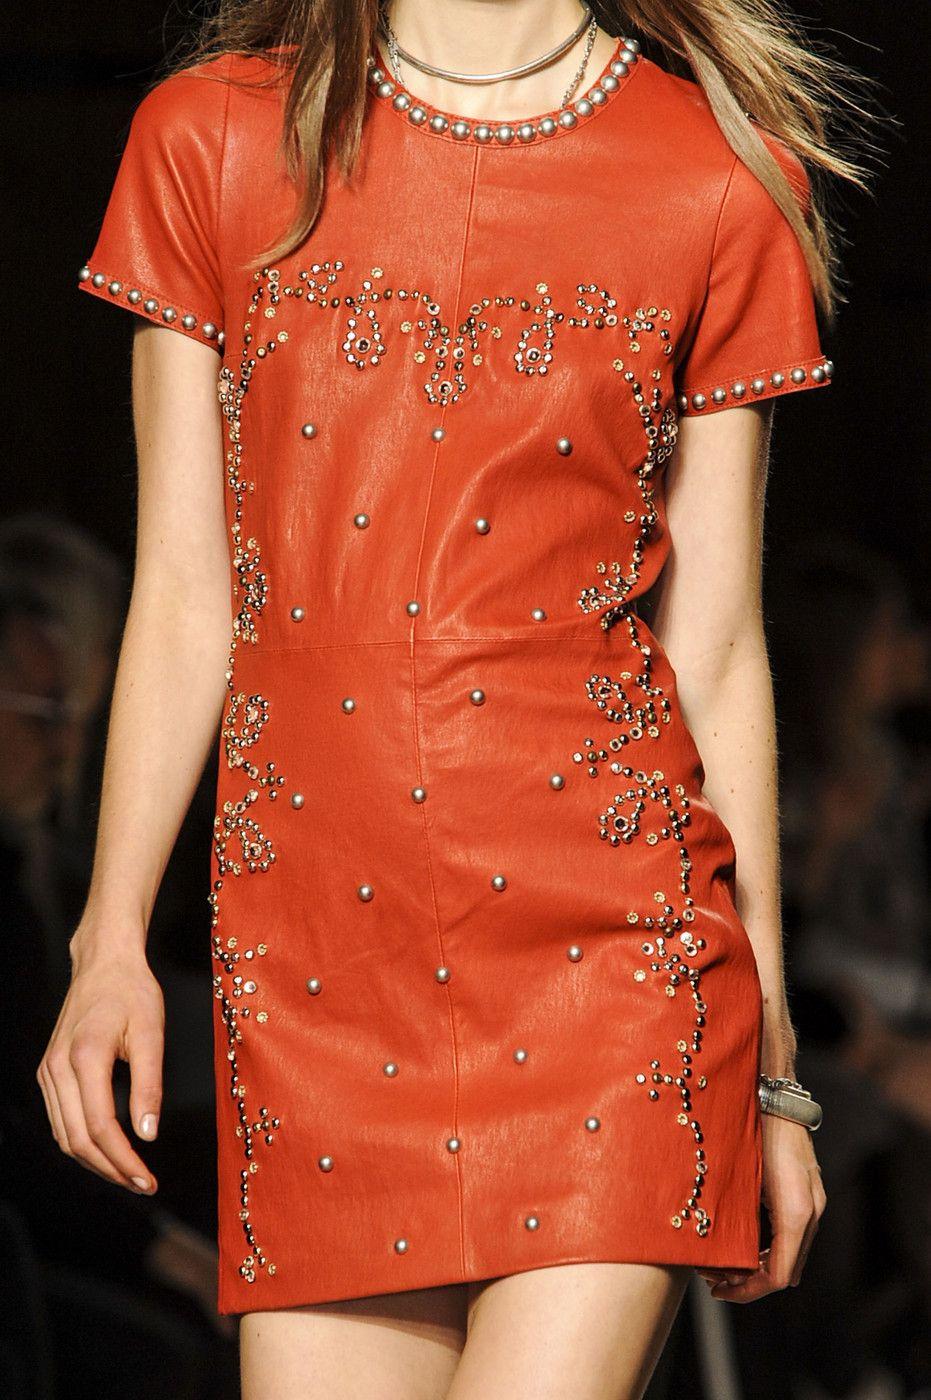 Isabel Marant at Paris Fashion Week Spring 2013 - StyleBistro